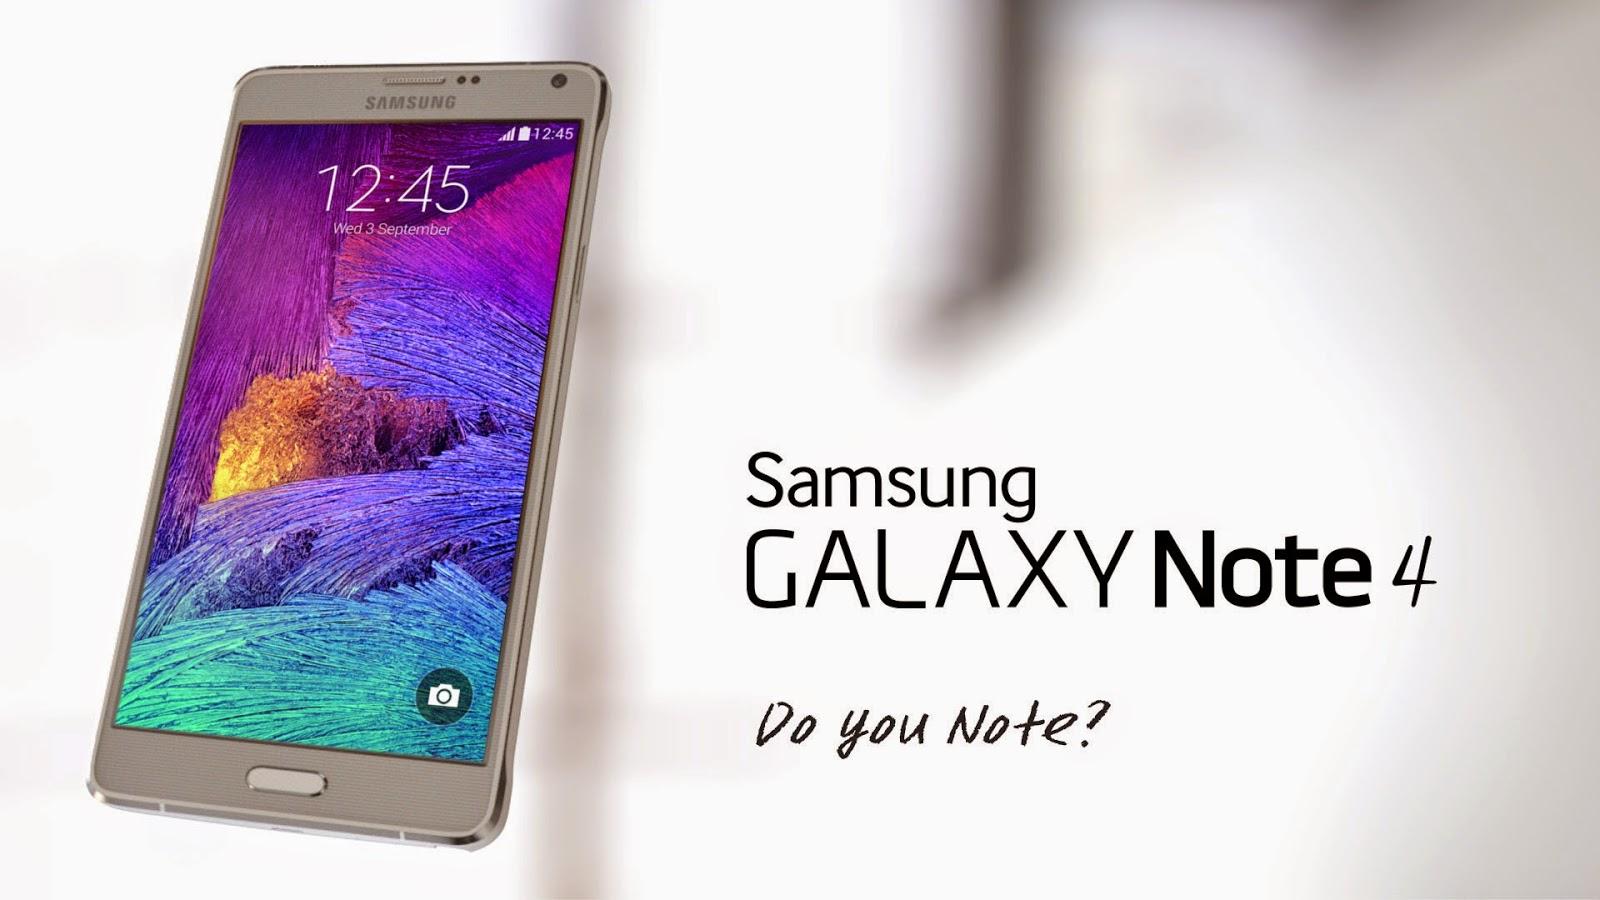 Harga Phablet Samsung Galaxy Note 4